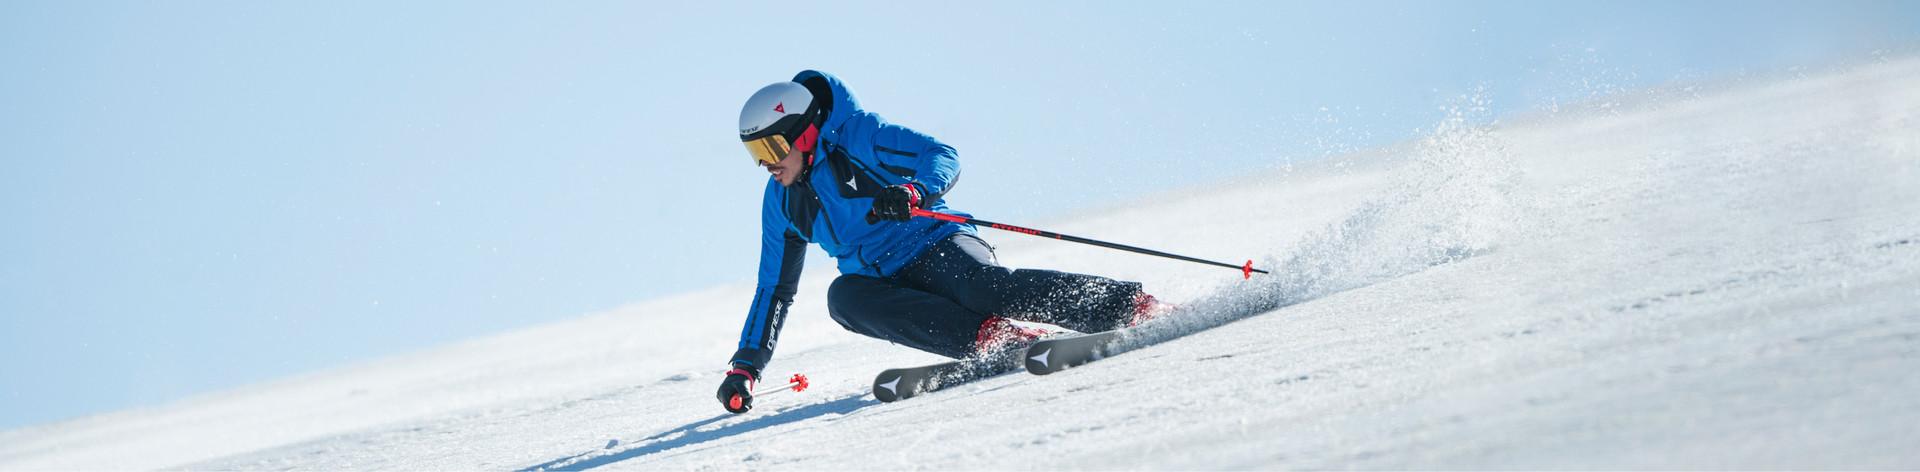 Dainese Winter Sports alpine skiing Jackets